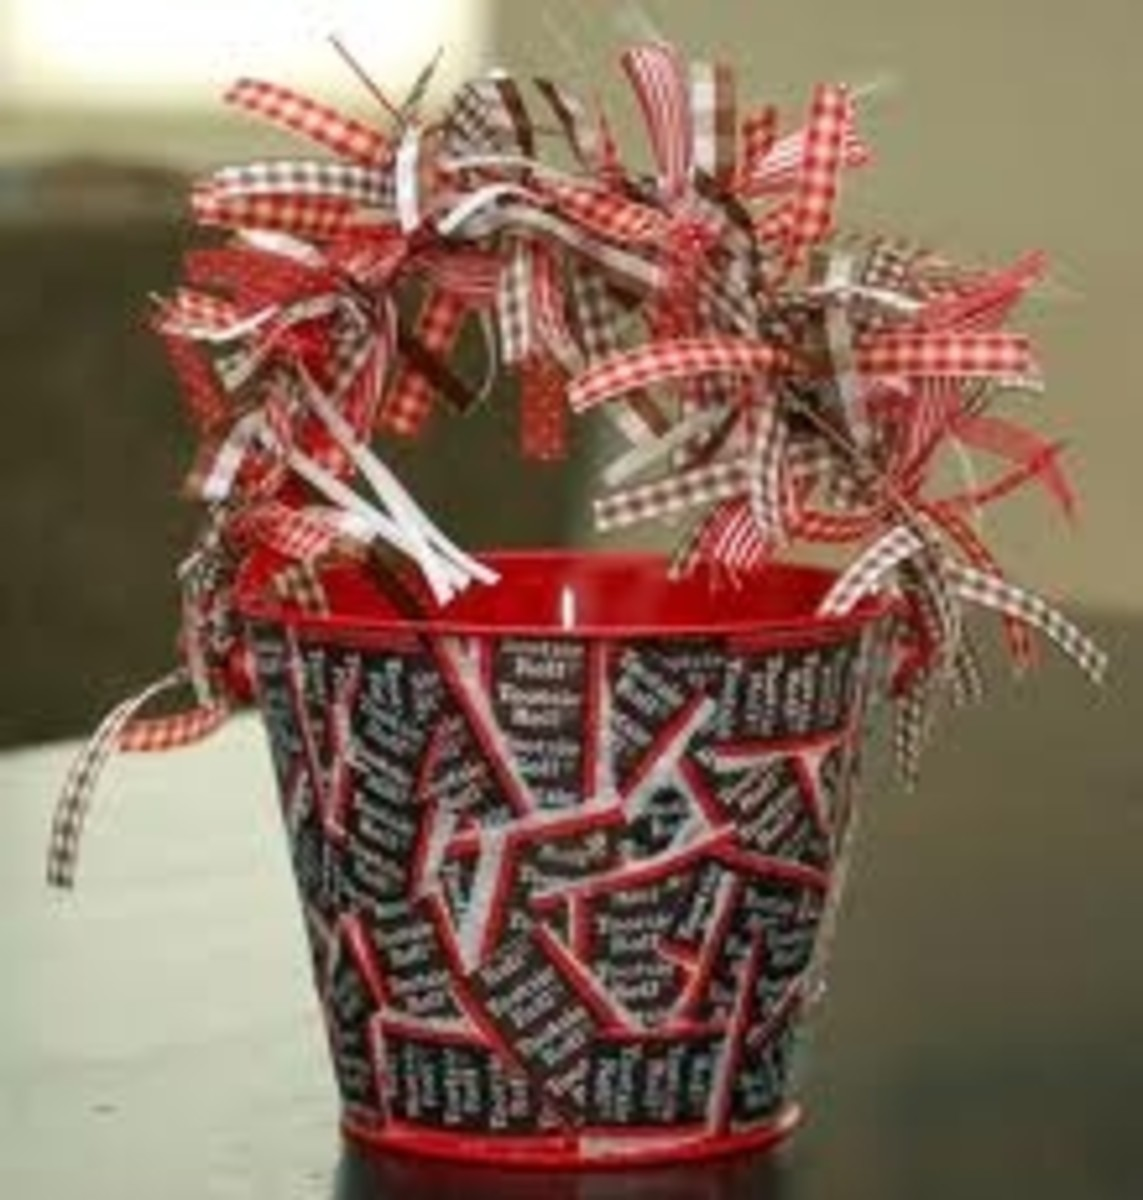 Tootie Roll Wrapper Bucket